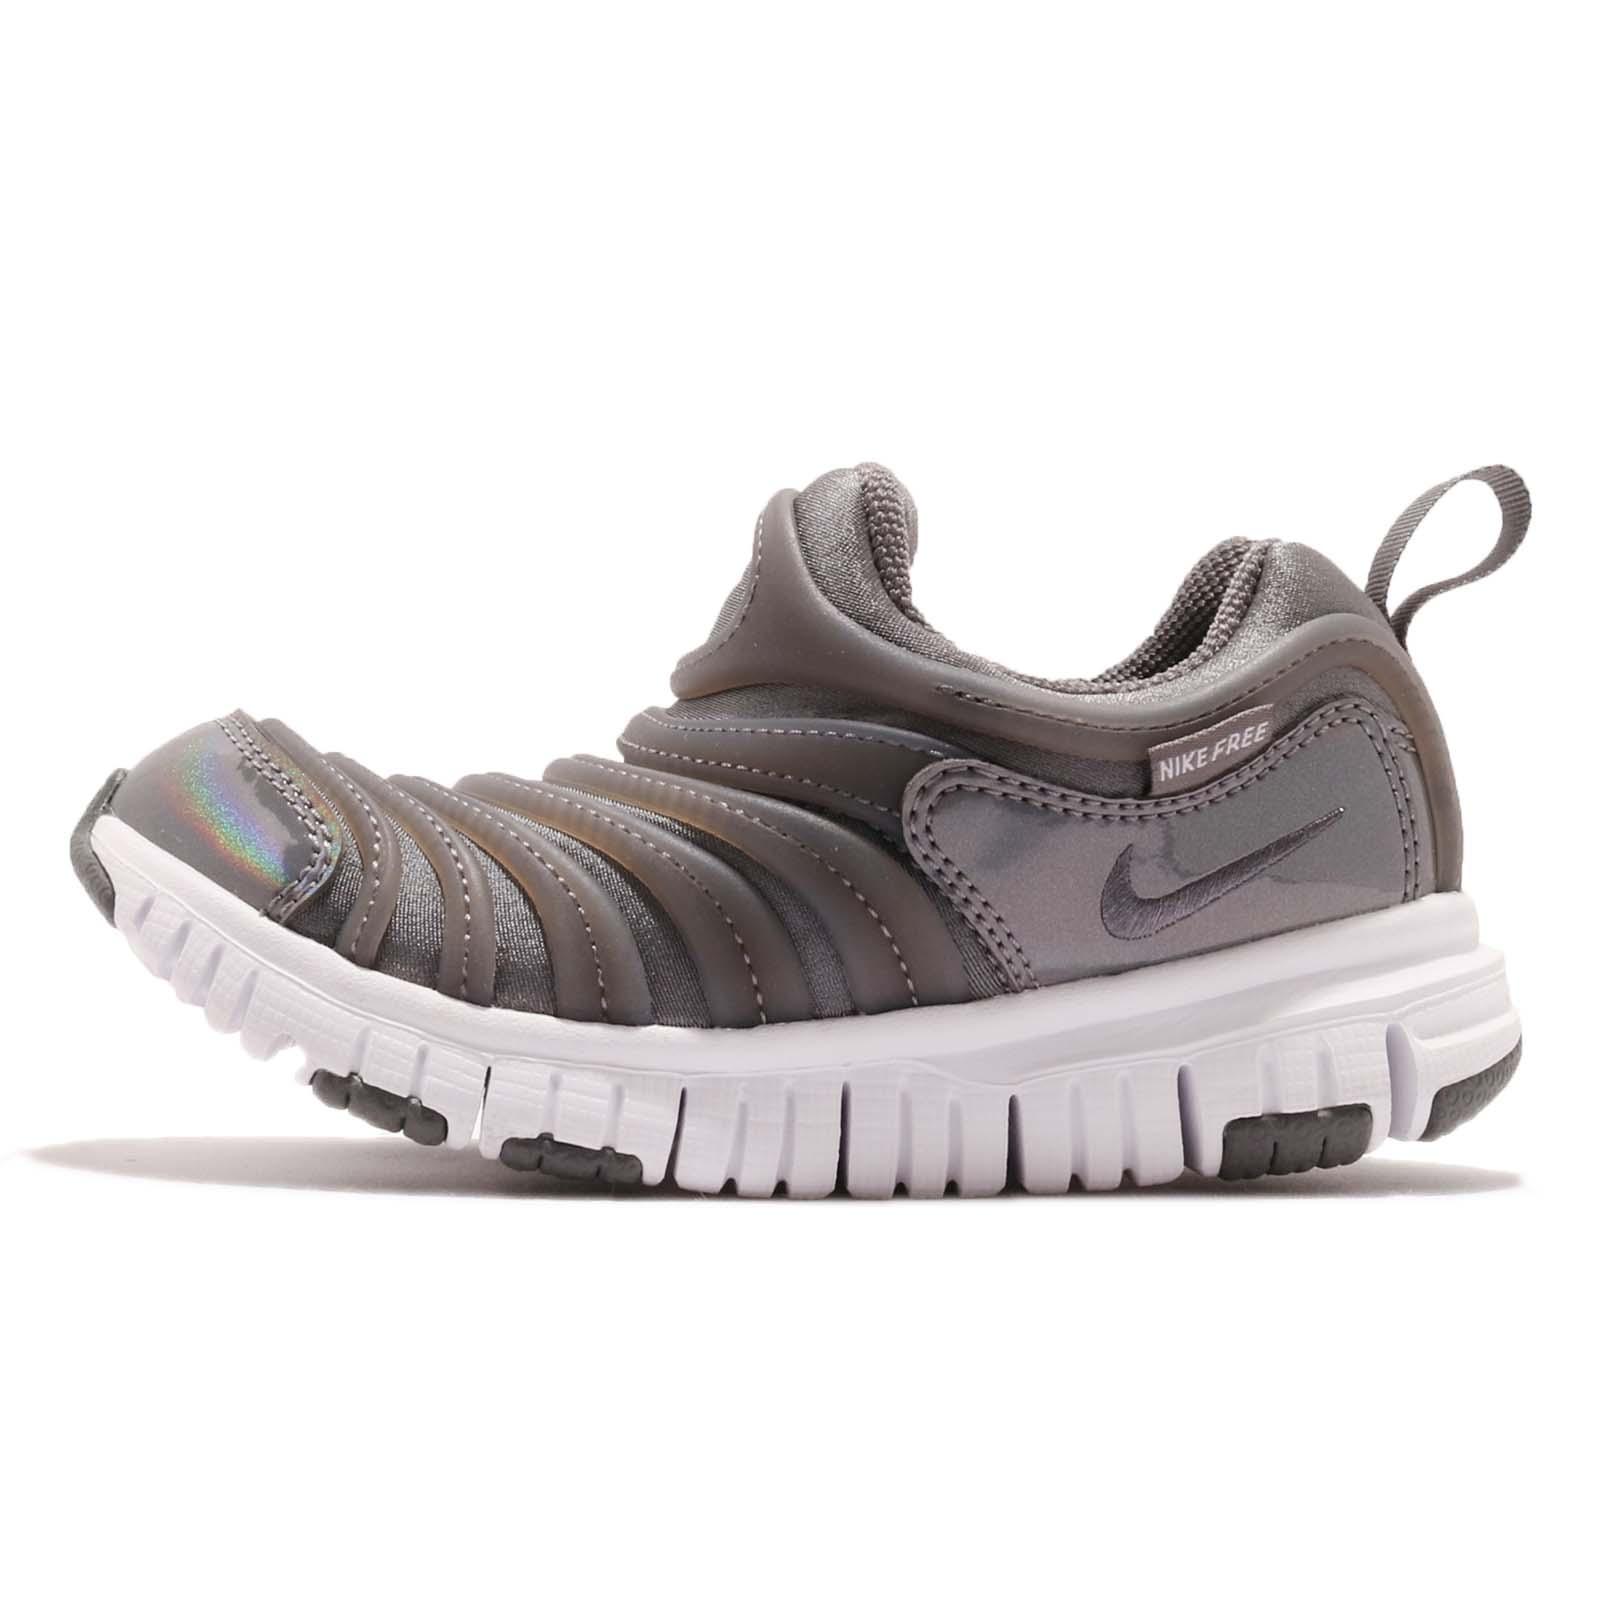 92ebdbc065f3b Nike Dynamo Free SE PS Grey White Preschool Boy Girl Slip On Shoes  AA7216-001